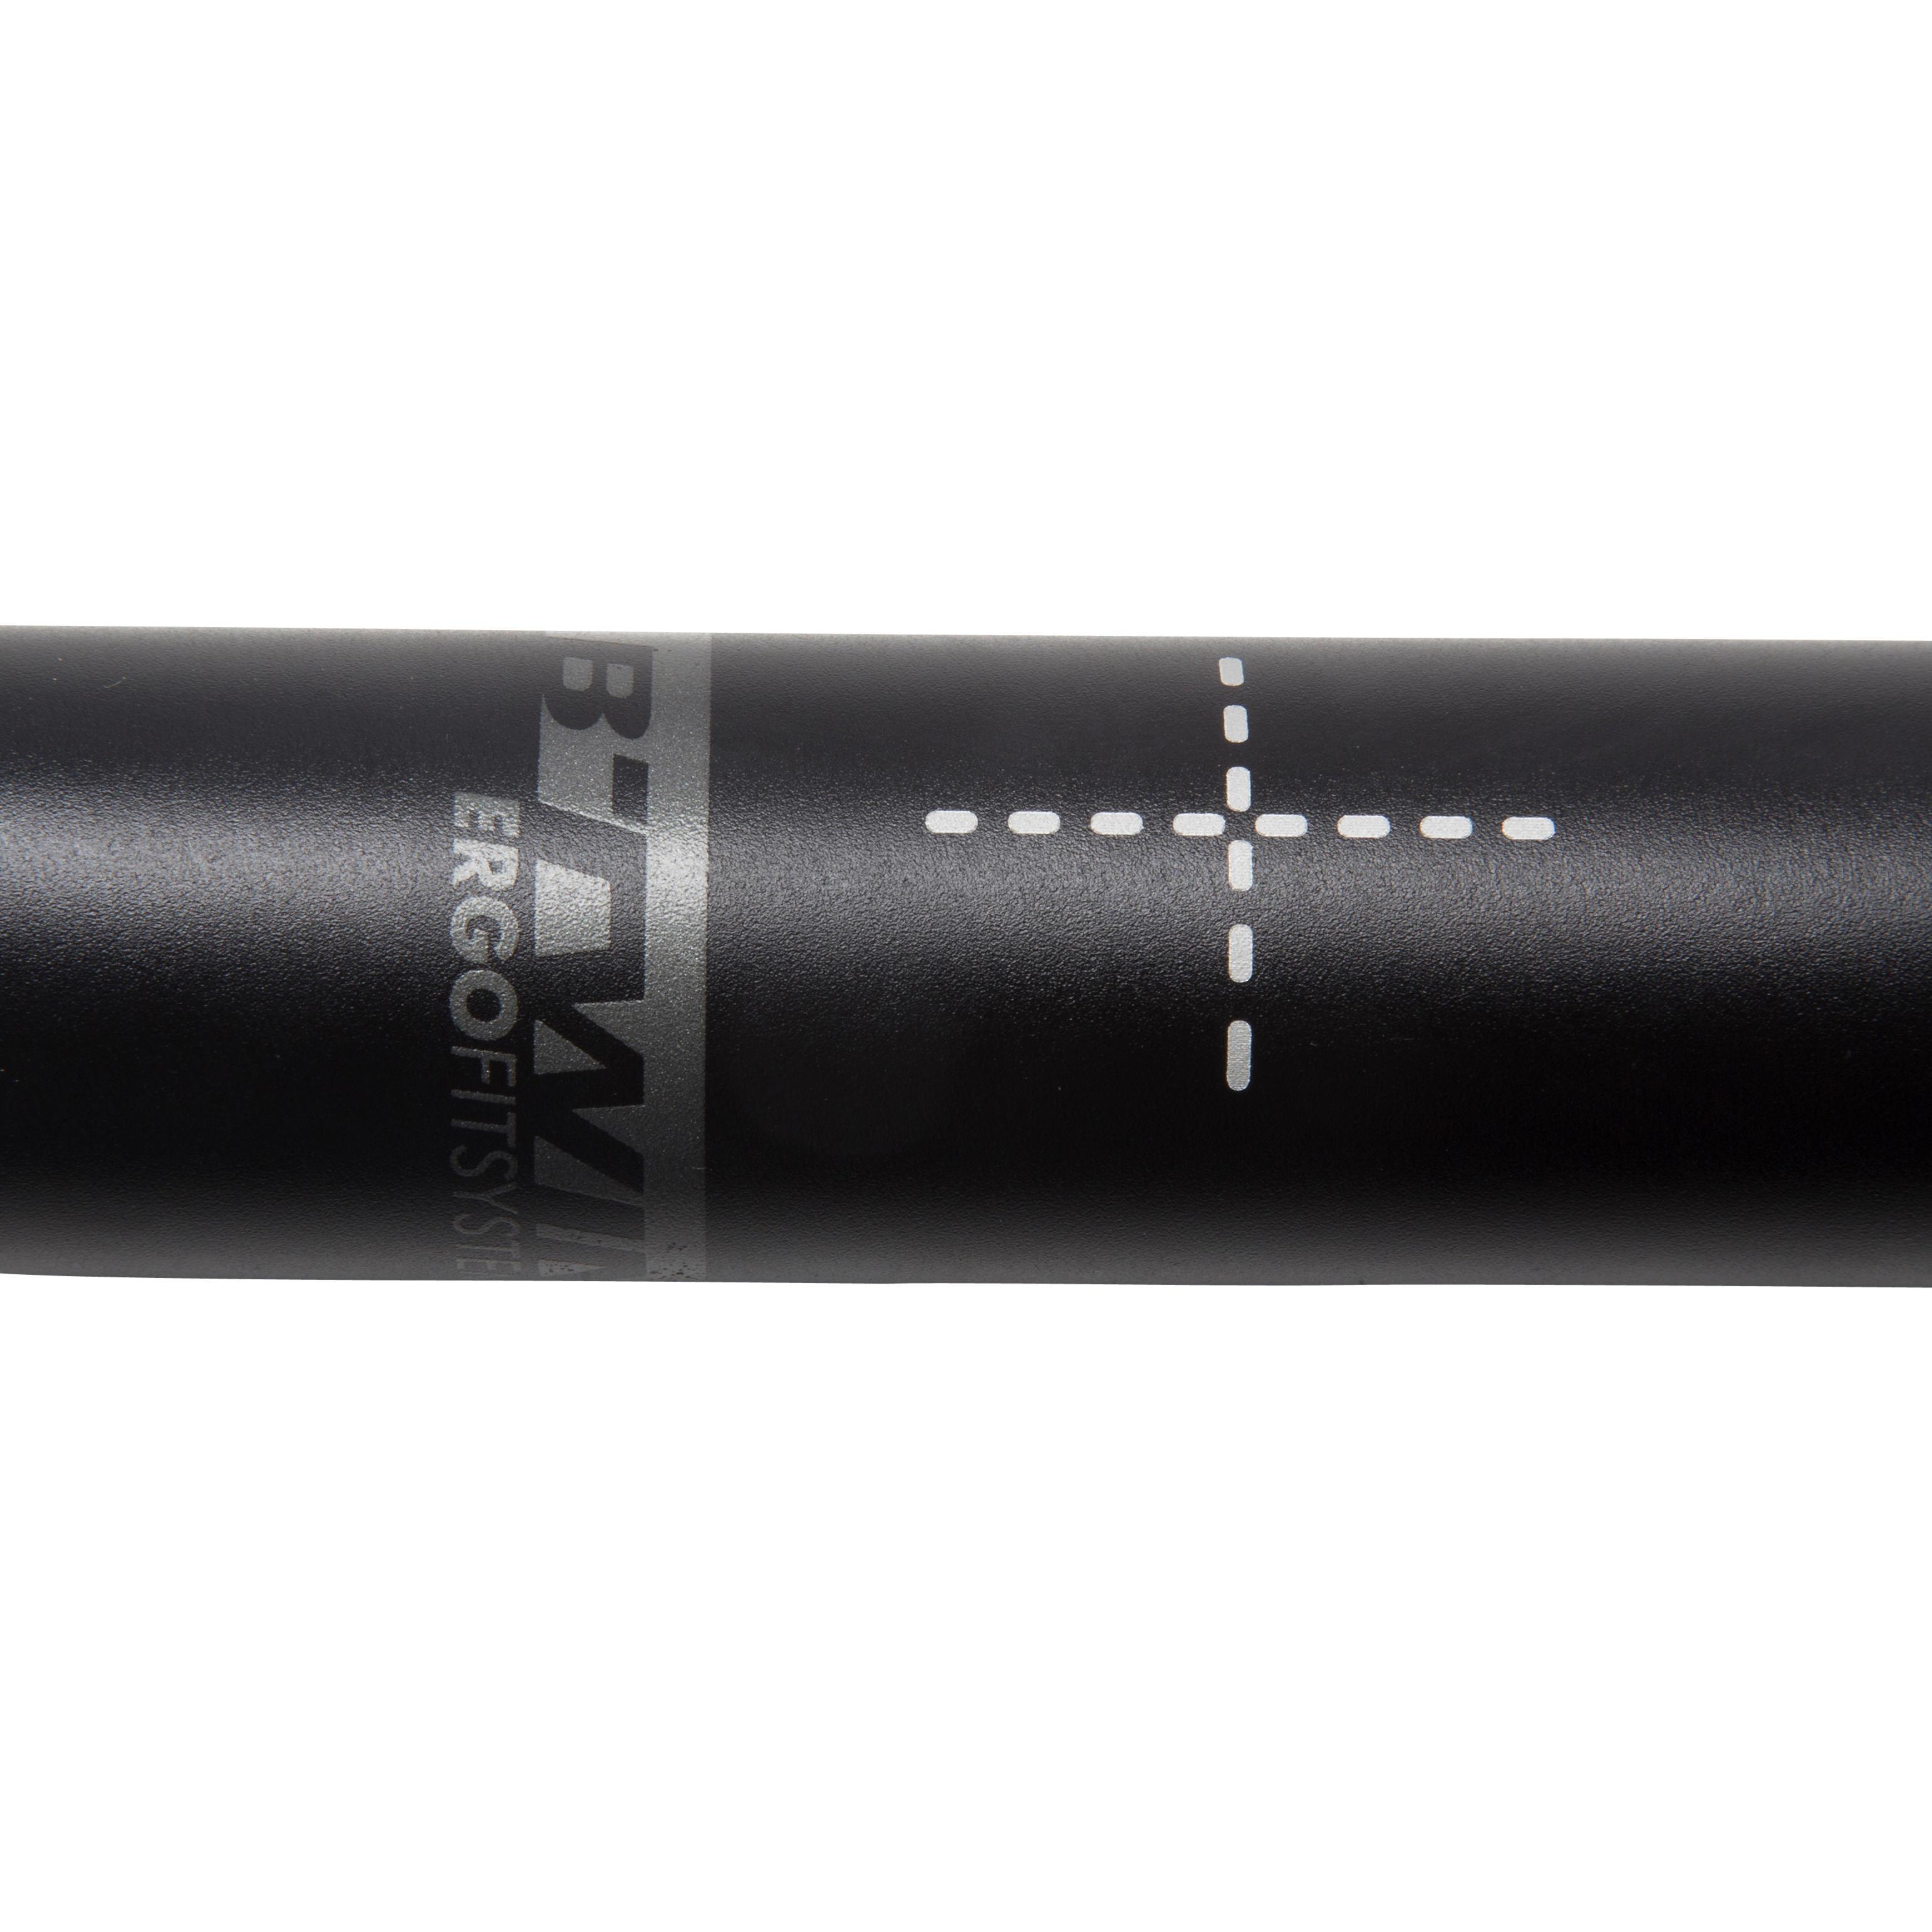 Ergonomic Road Bike Handlebar 31.8 mm x 42 cm - Black